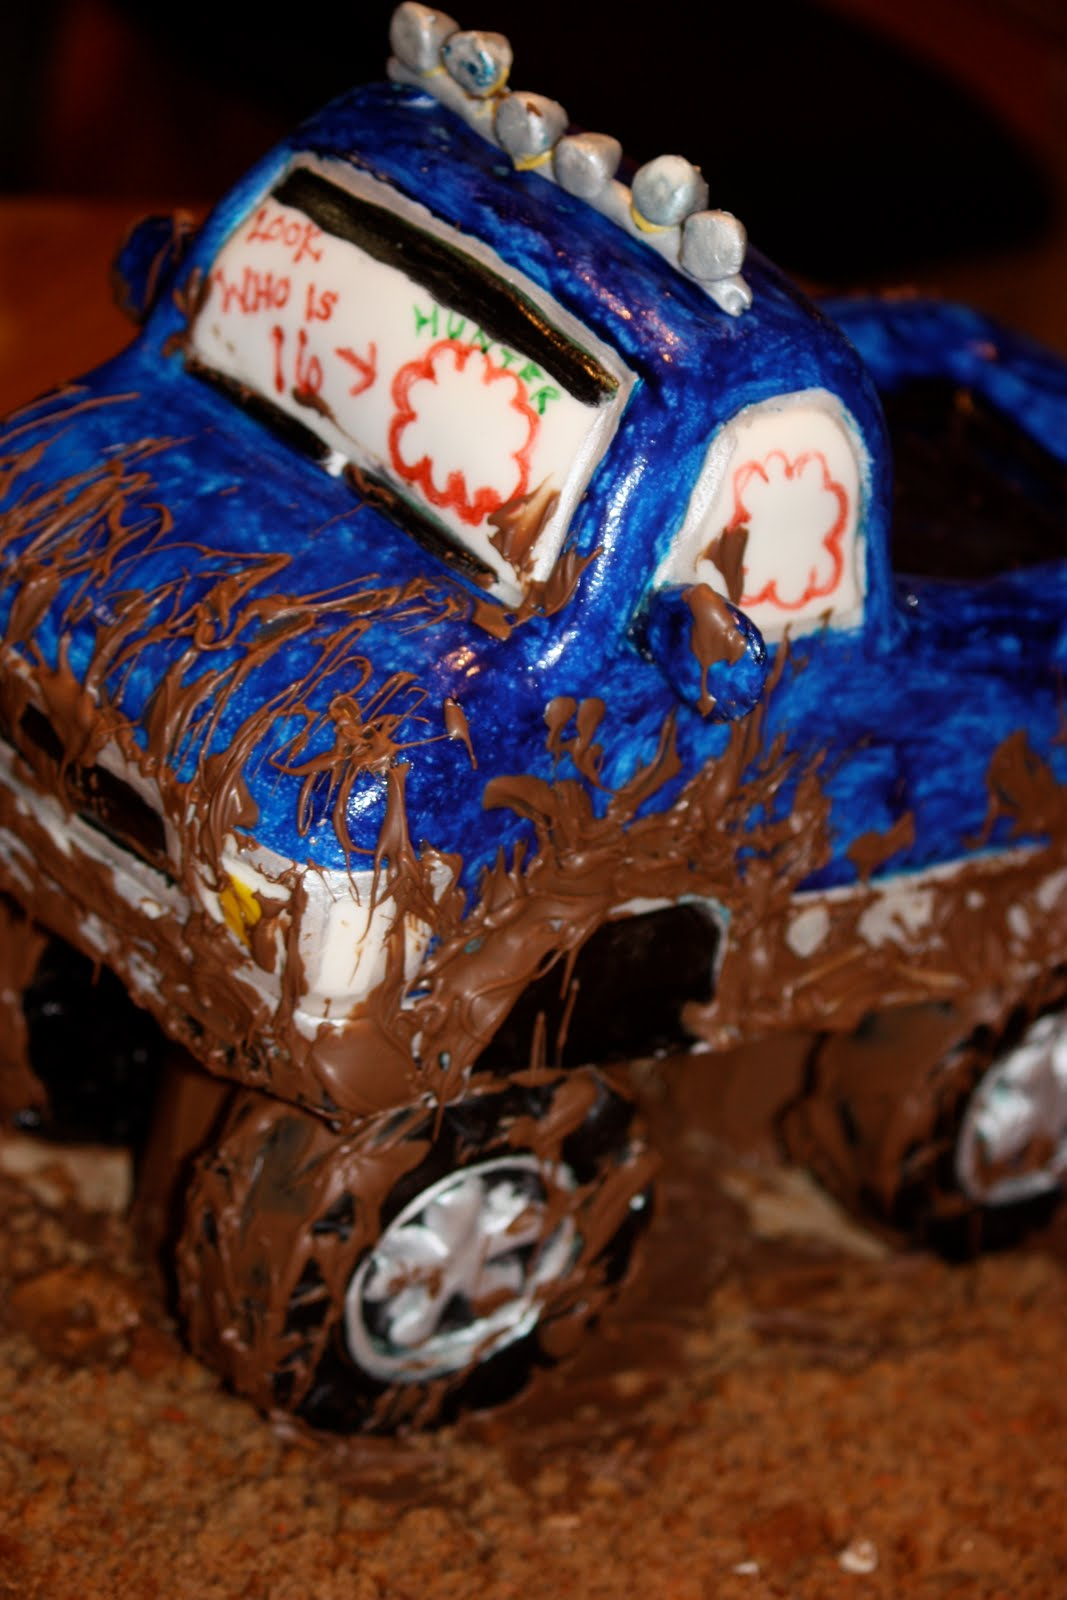 Breezie S Cakes Mudding Truck Cake